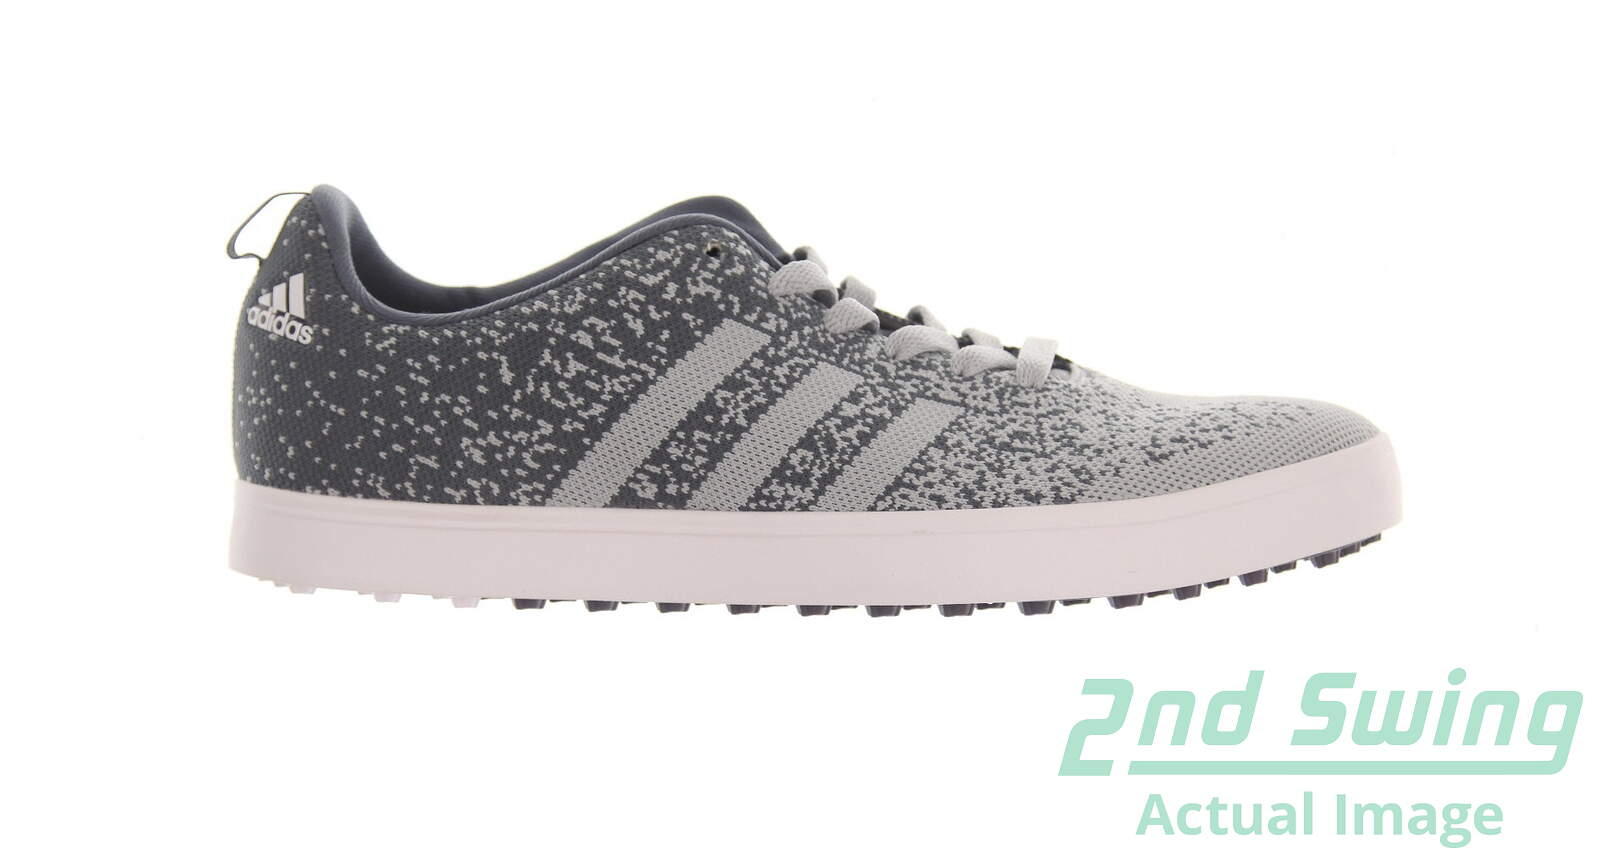 New Mens Golf Shoe Adidas Adicross Primeknit Medium 9 5 Gray Msrp 115 F33395 Golf Footwear 2nd Swing Golf